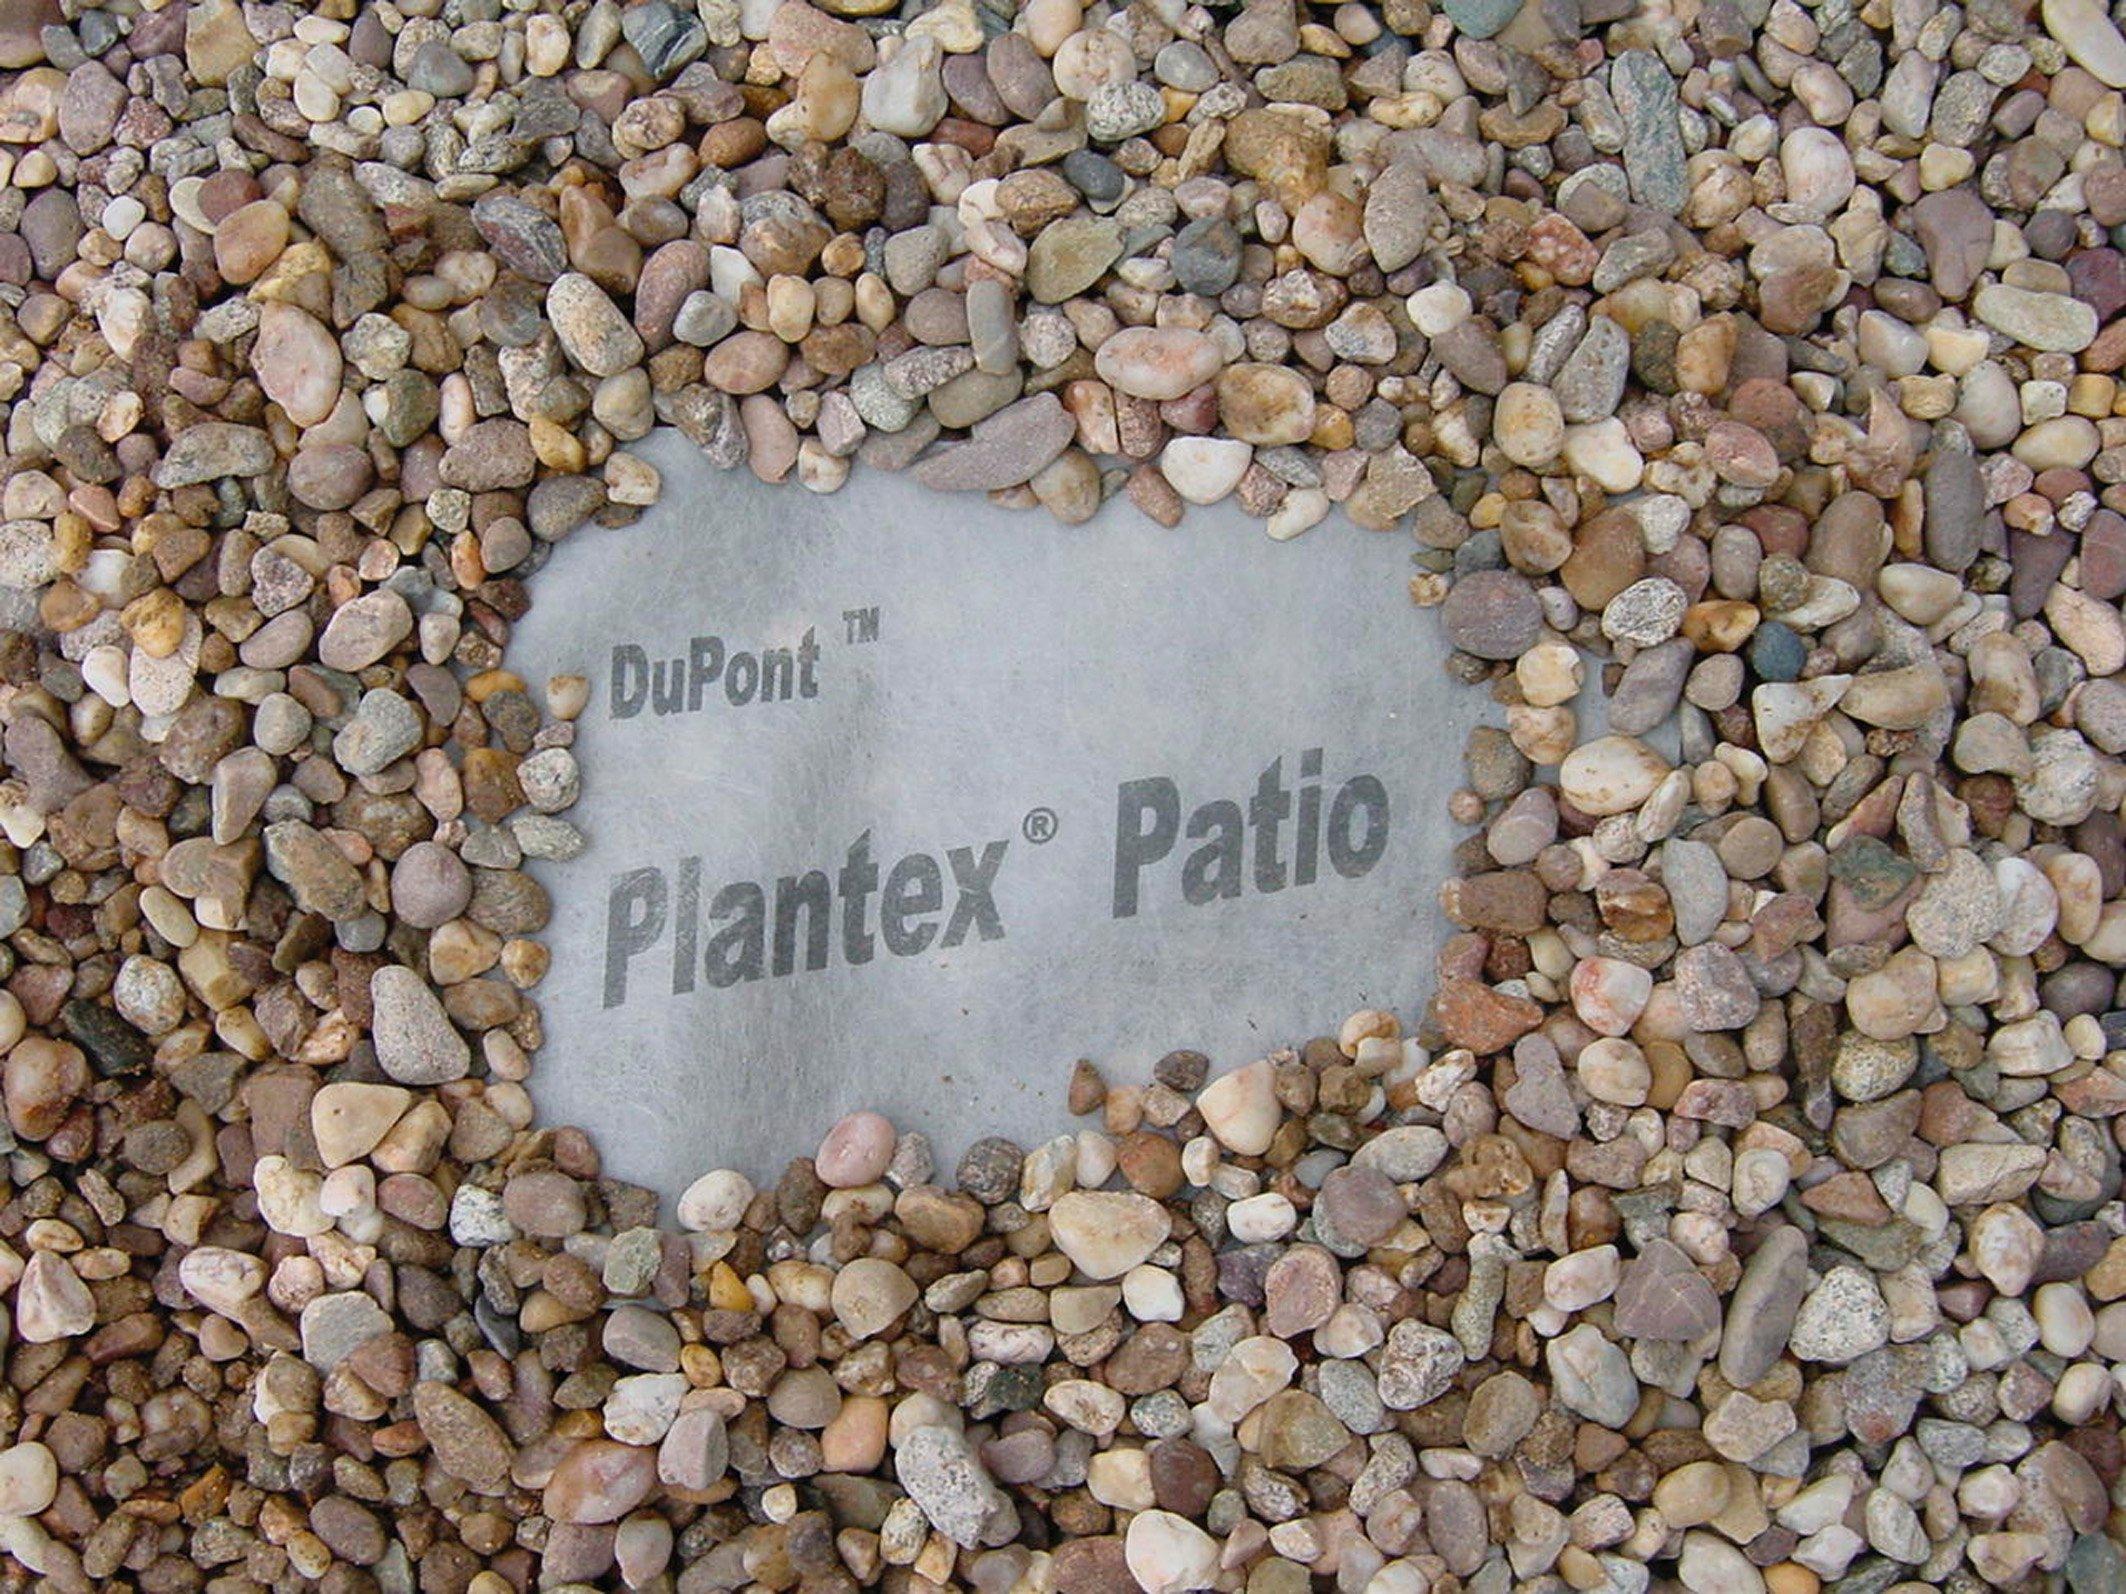 Plantex® Patio - Großrolle 1,0 x 200 m